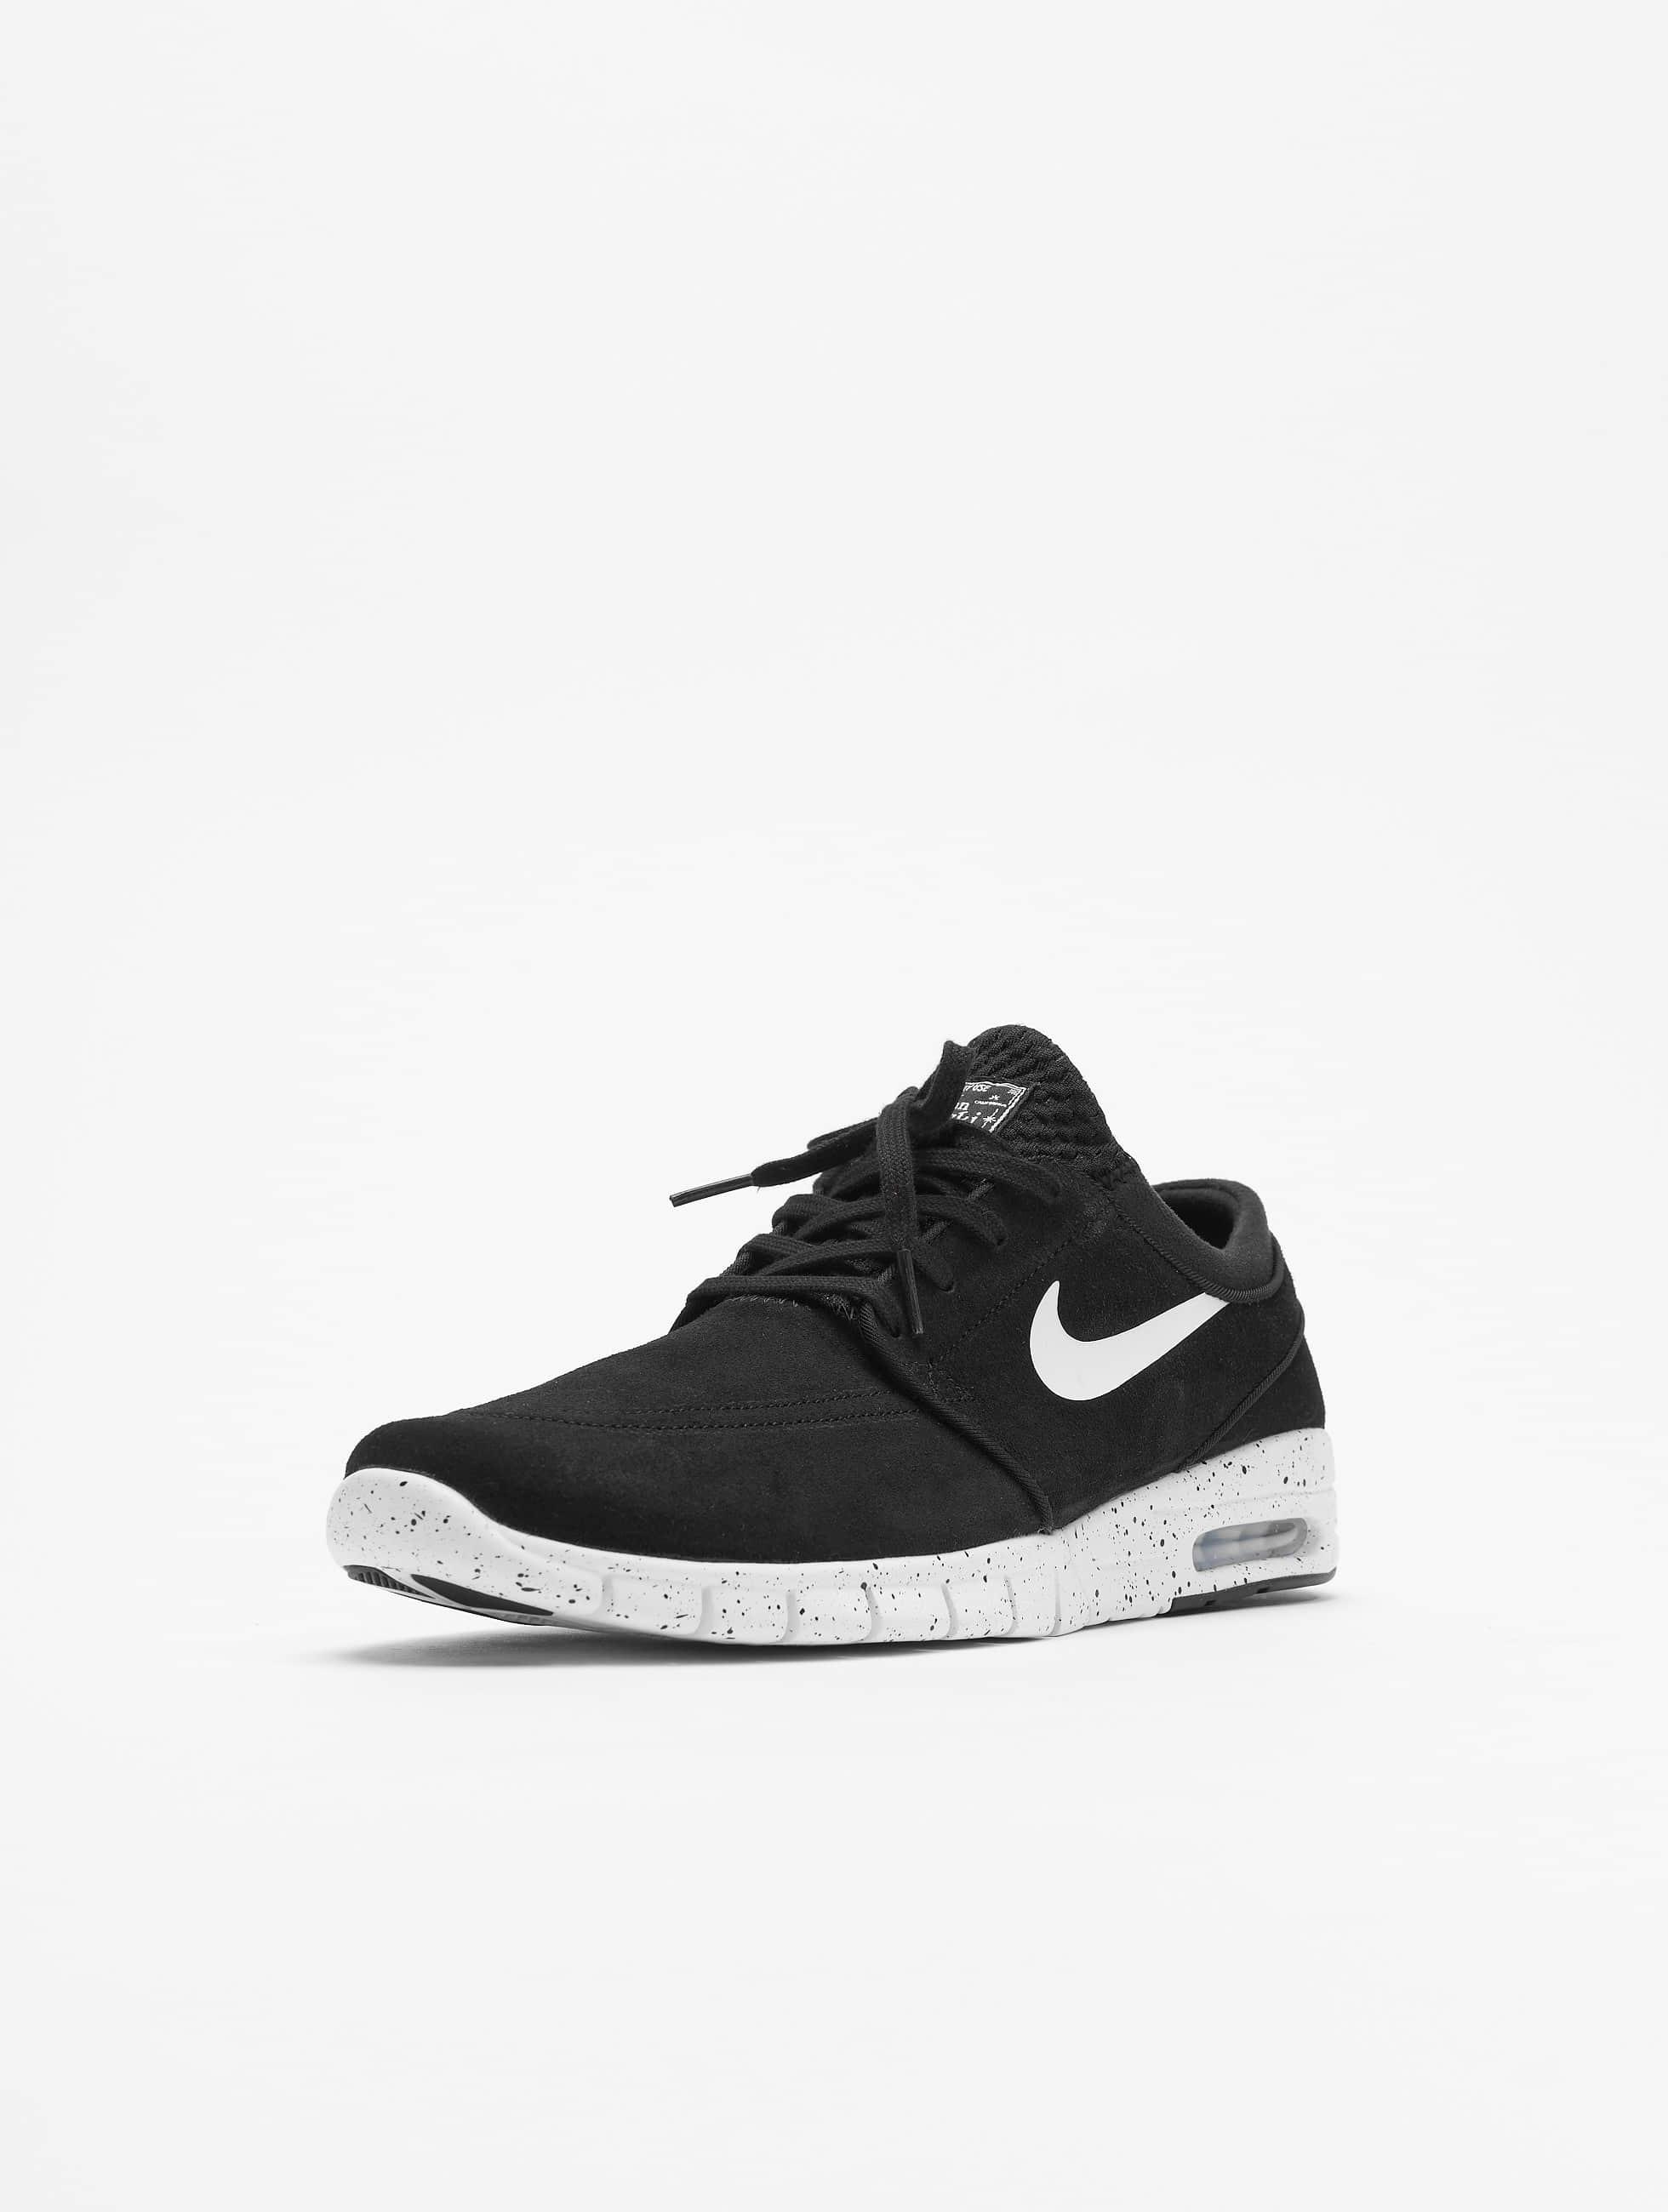 Nike Sb Stefan Janoski Grau Schwarz